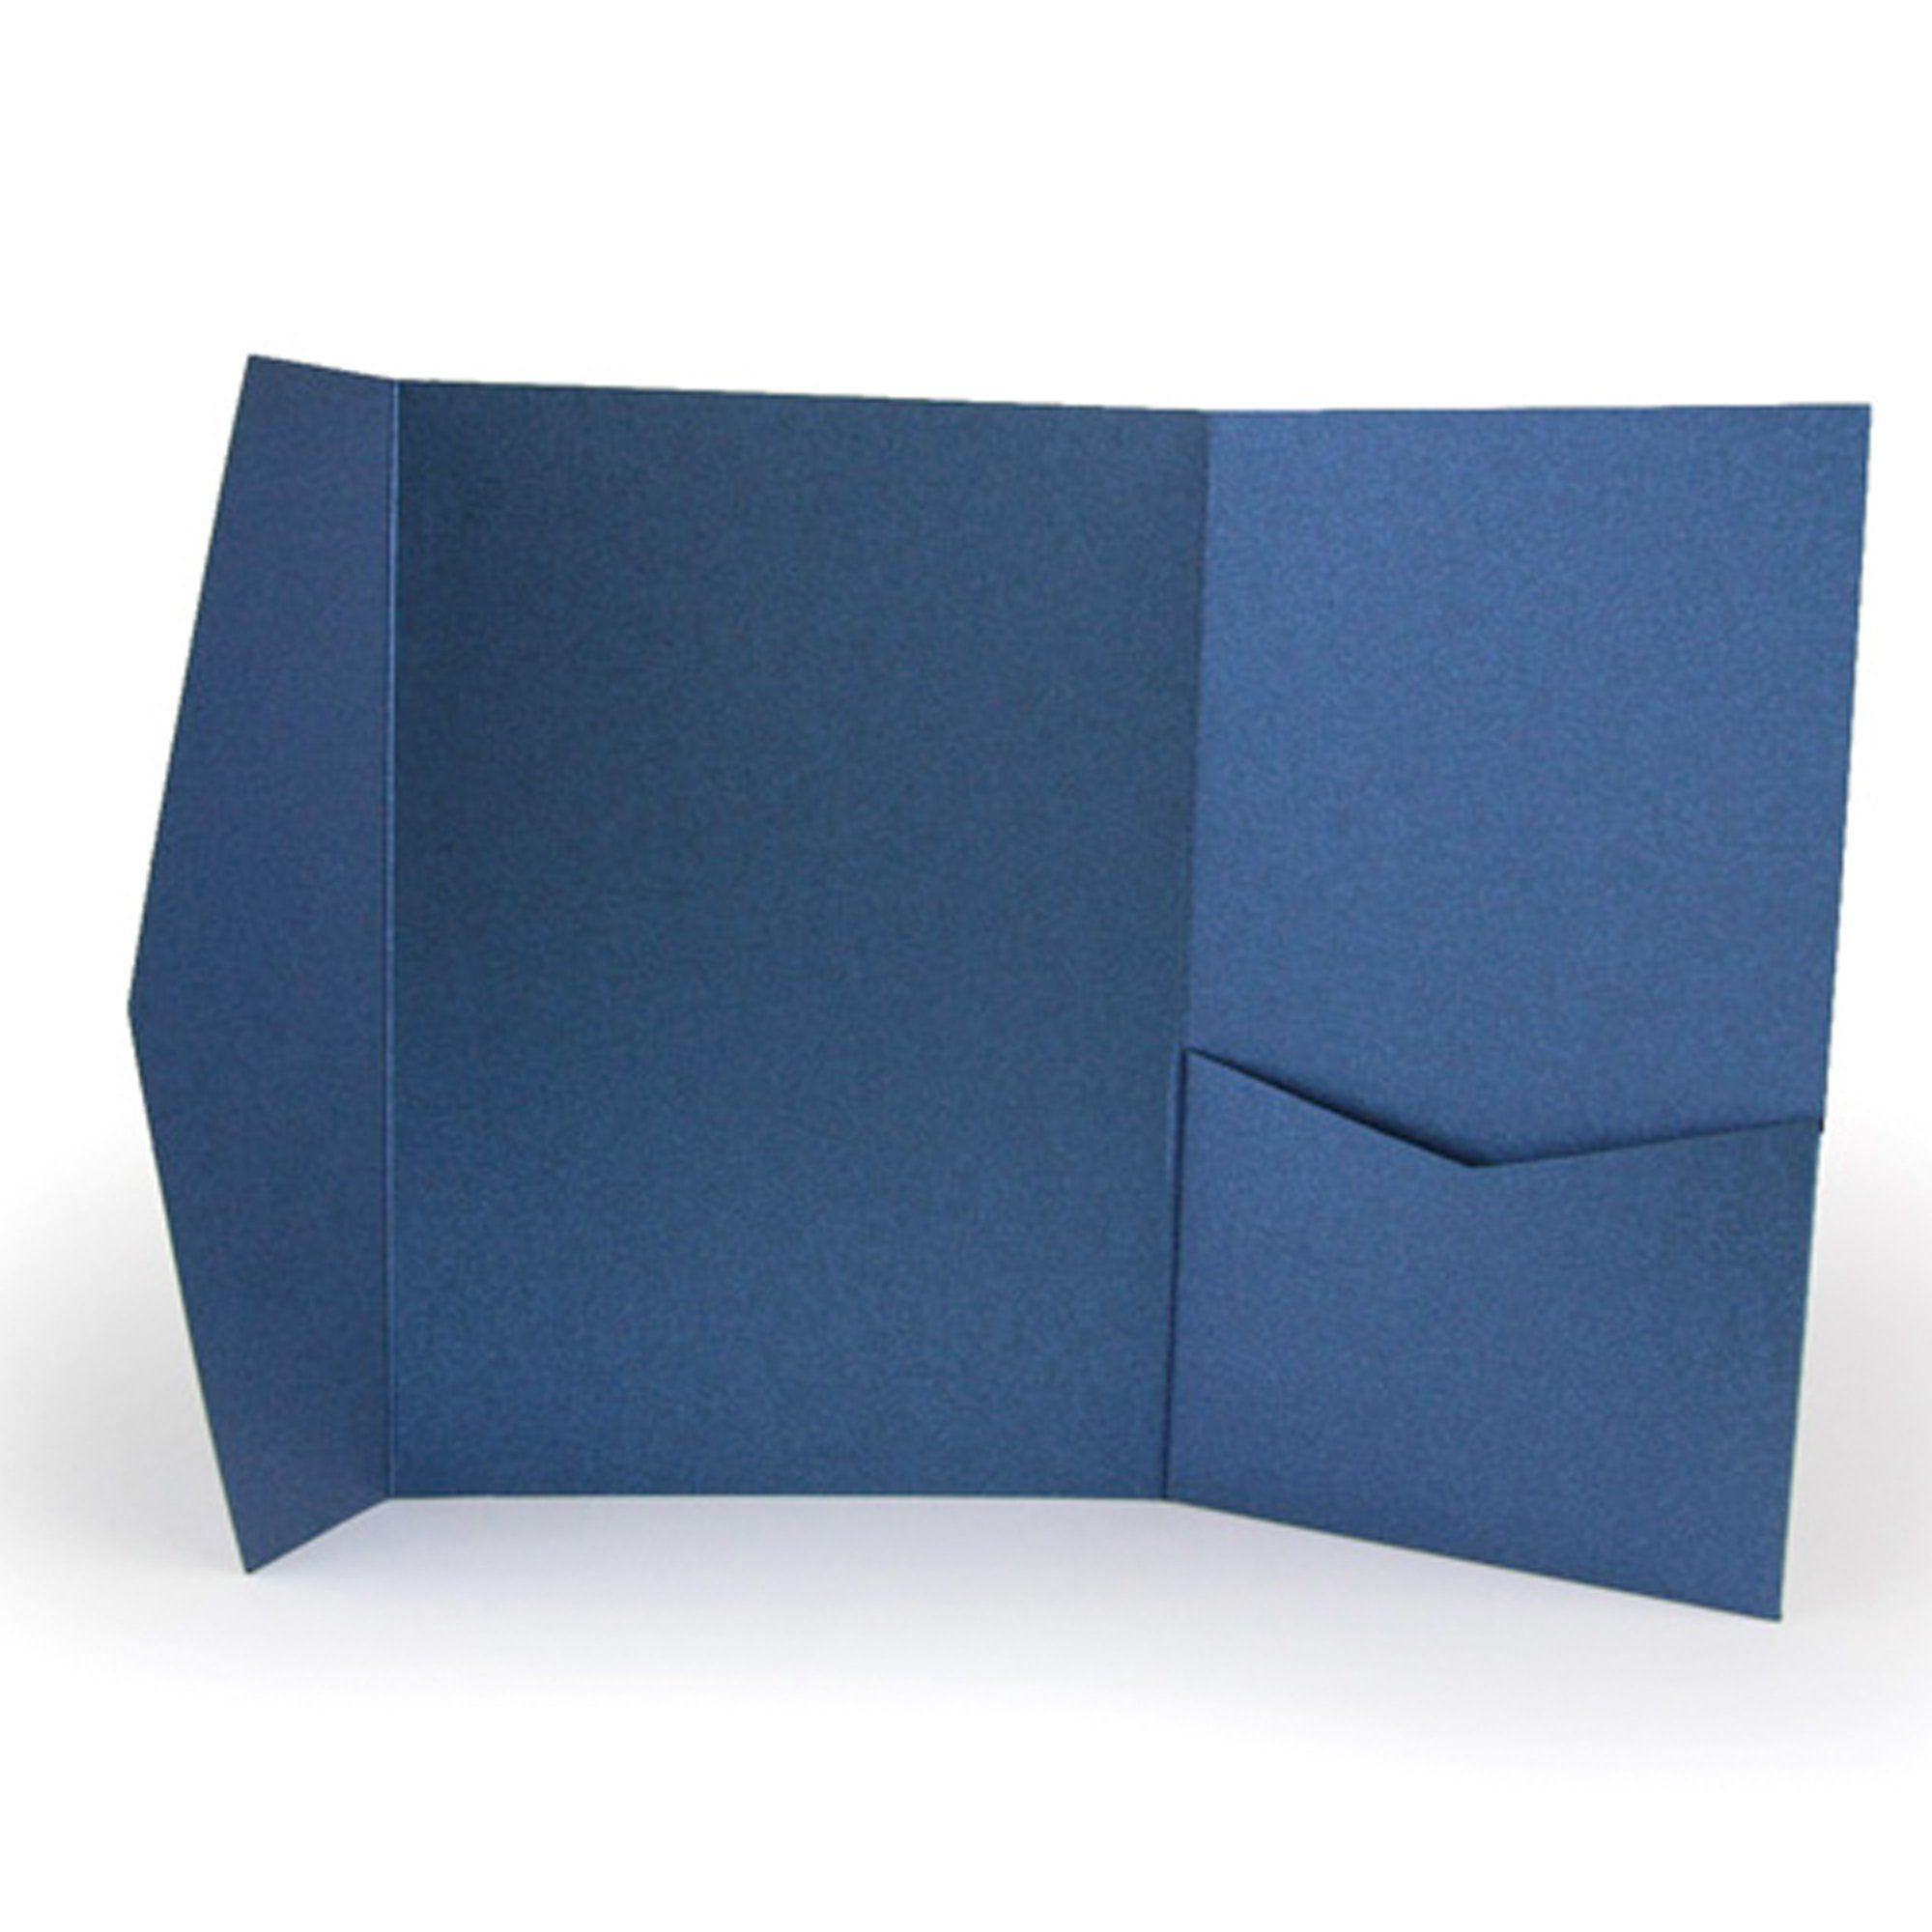 A7 Pocket Envelope Metallic Dark Blue 176 Holder Wedding Blue Envelopes Personalized Baby Shower Invitations